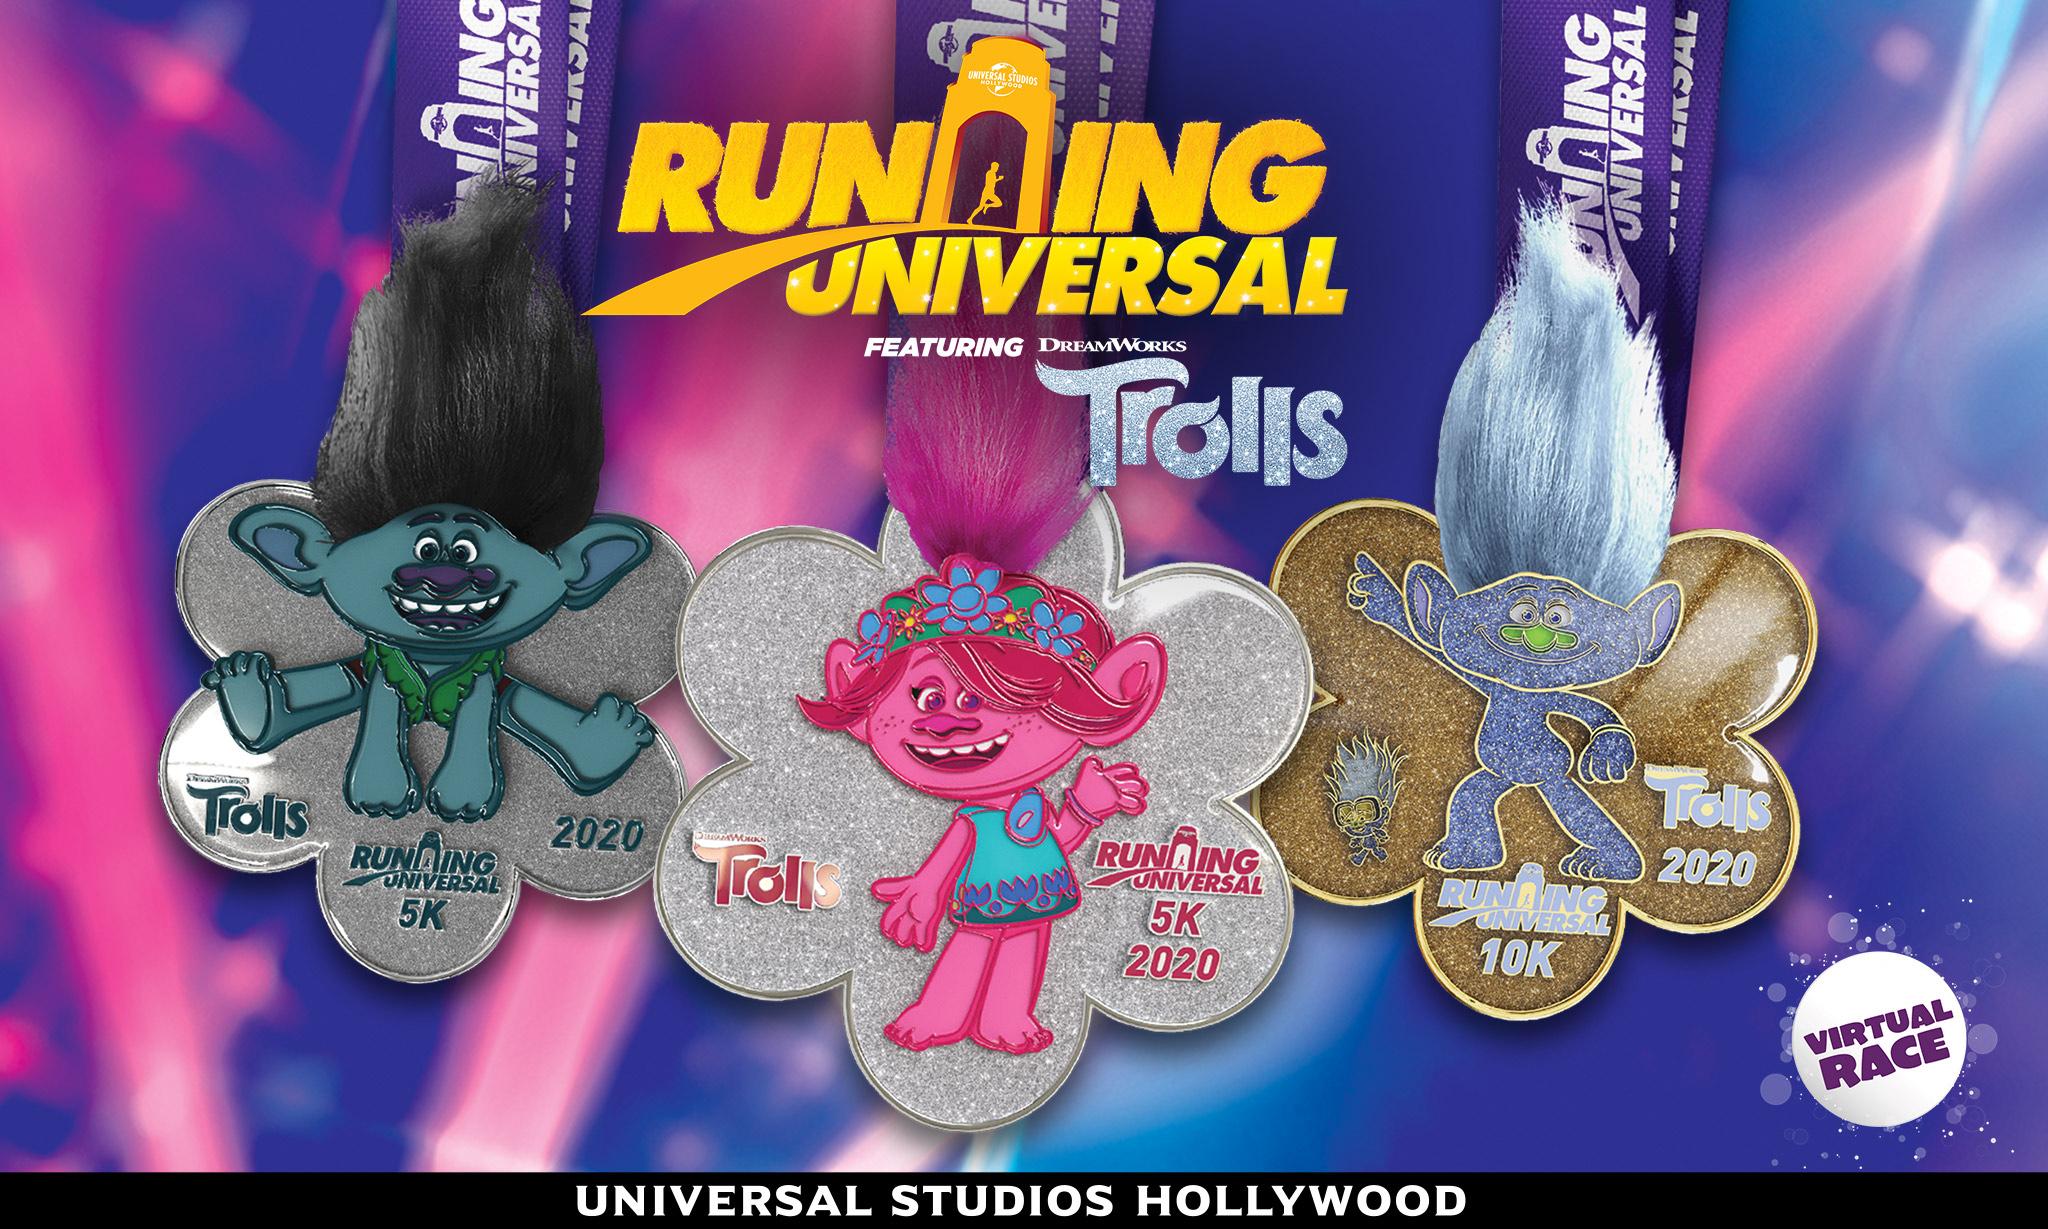 Universal Studio Hollywood好莱坞影城将举办魔发精灵虚拟赛跑